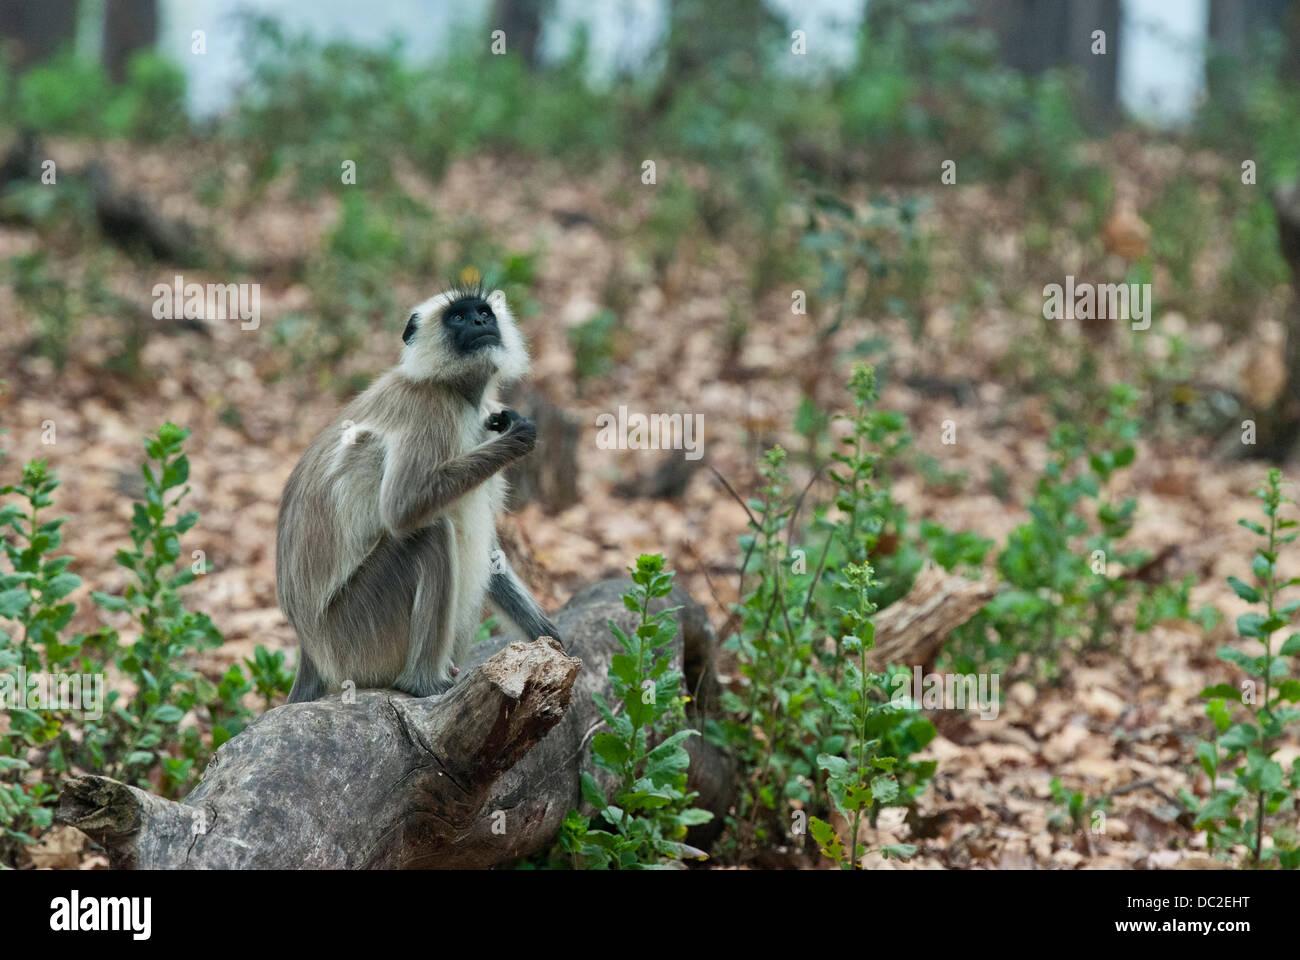 Black-faced Langur monkey sitting on a log in Bandhavgarh National Park, India - Stock Image